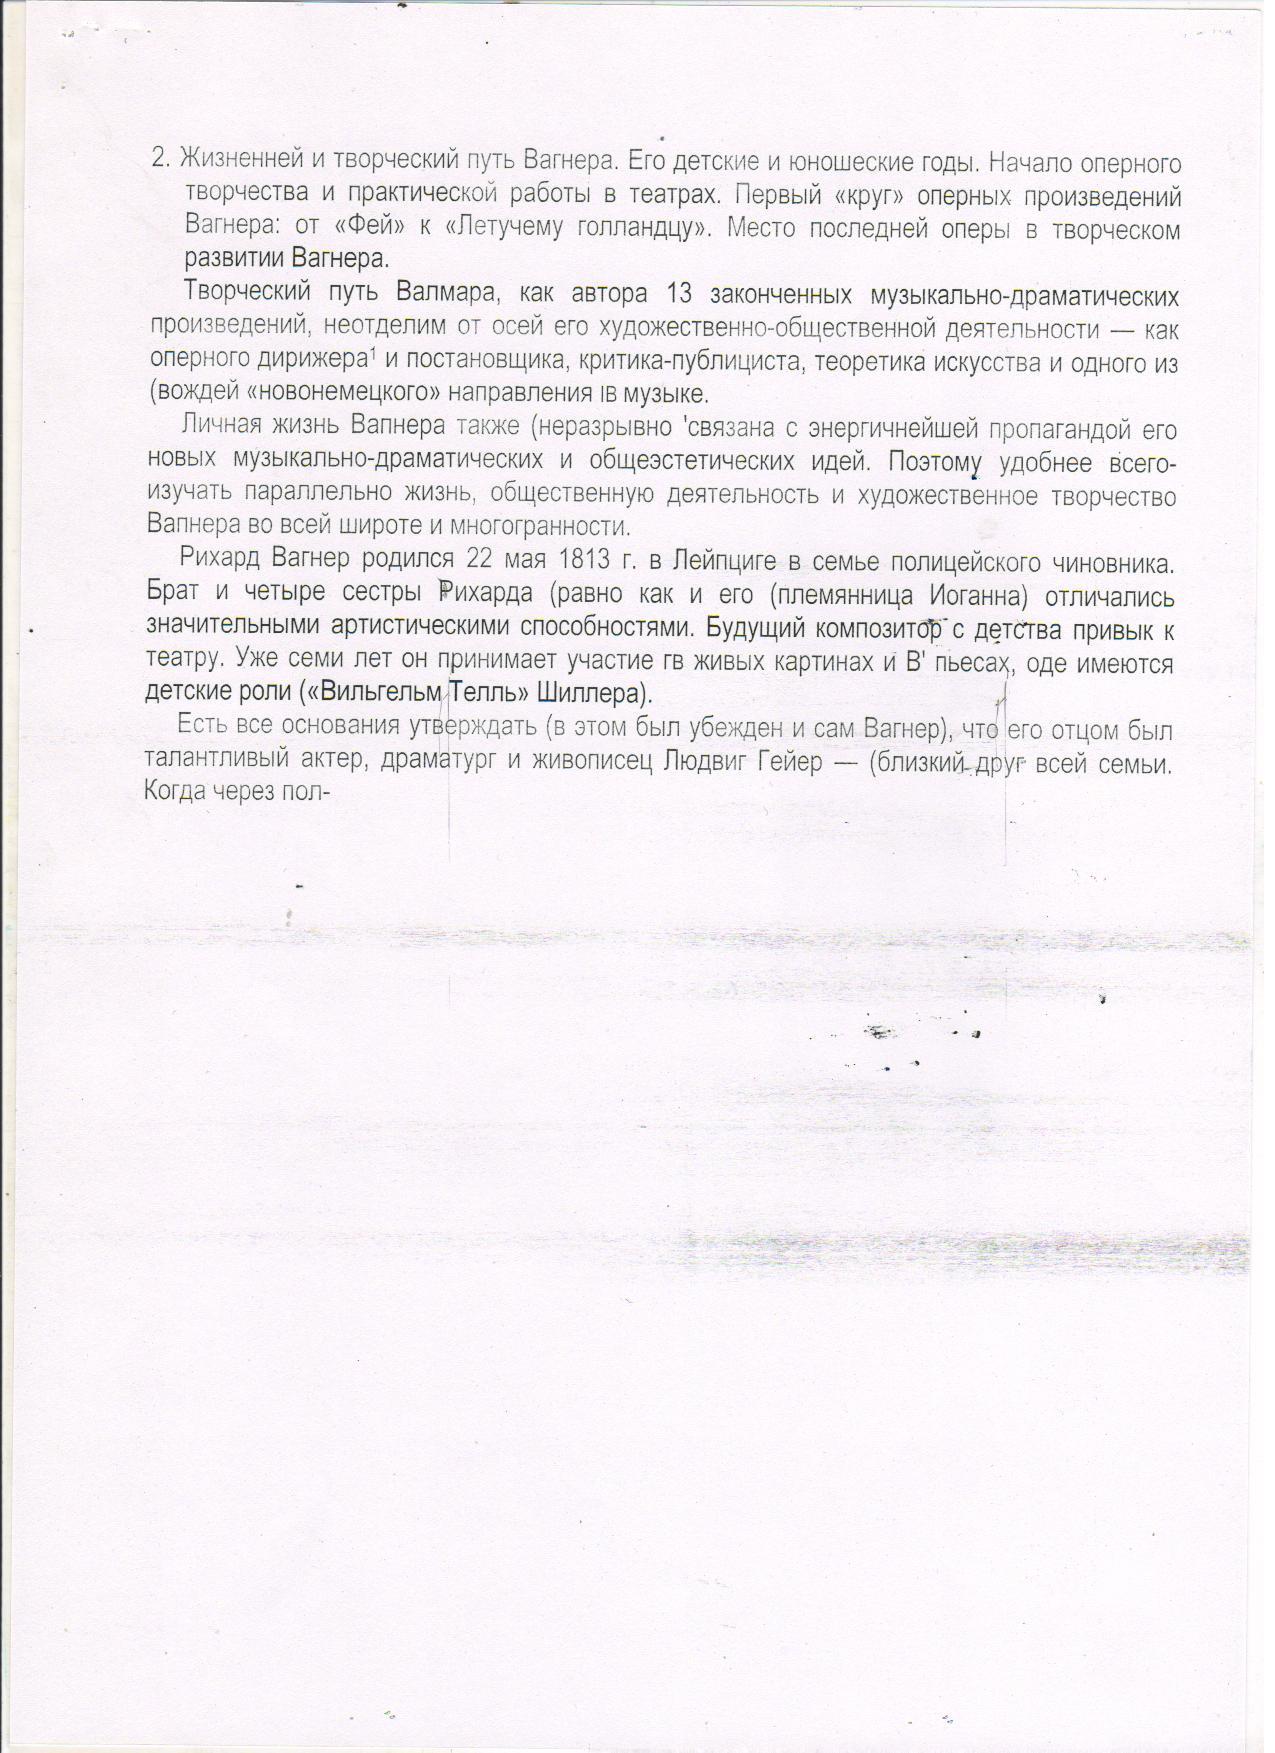 C:\Documents and Settings\Учитель\Рабочий стол\творчество Вагнера 3.jpg